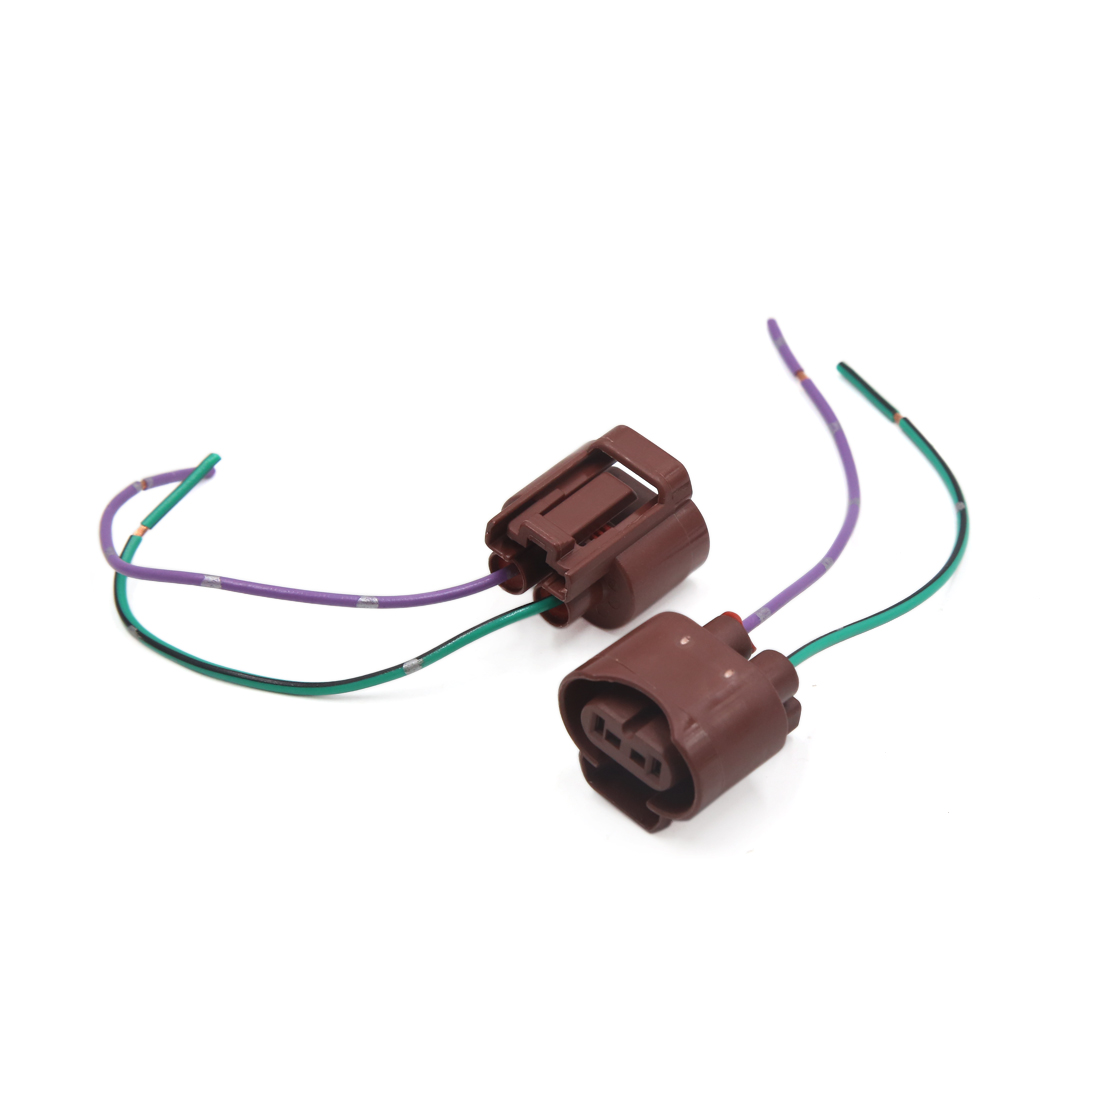 2pcs 9006 foglight lamp bulb extension wire harness socket connector [ 1100 x 1100 Pixel ]